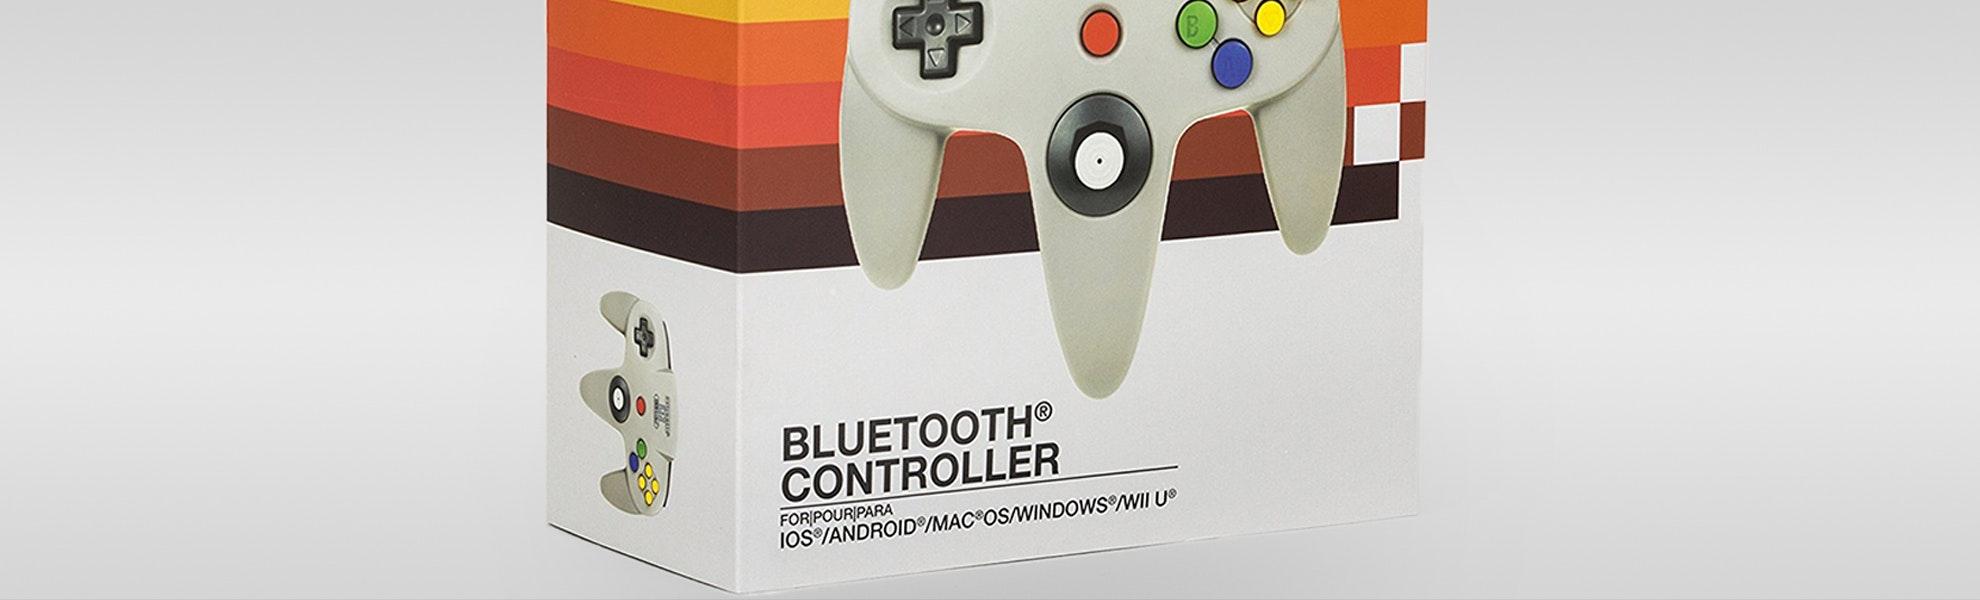 8Bitdo N64 Bluetooth Controller